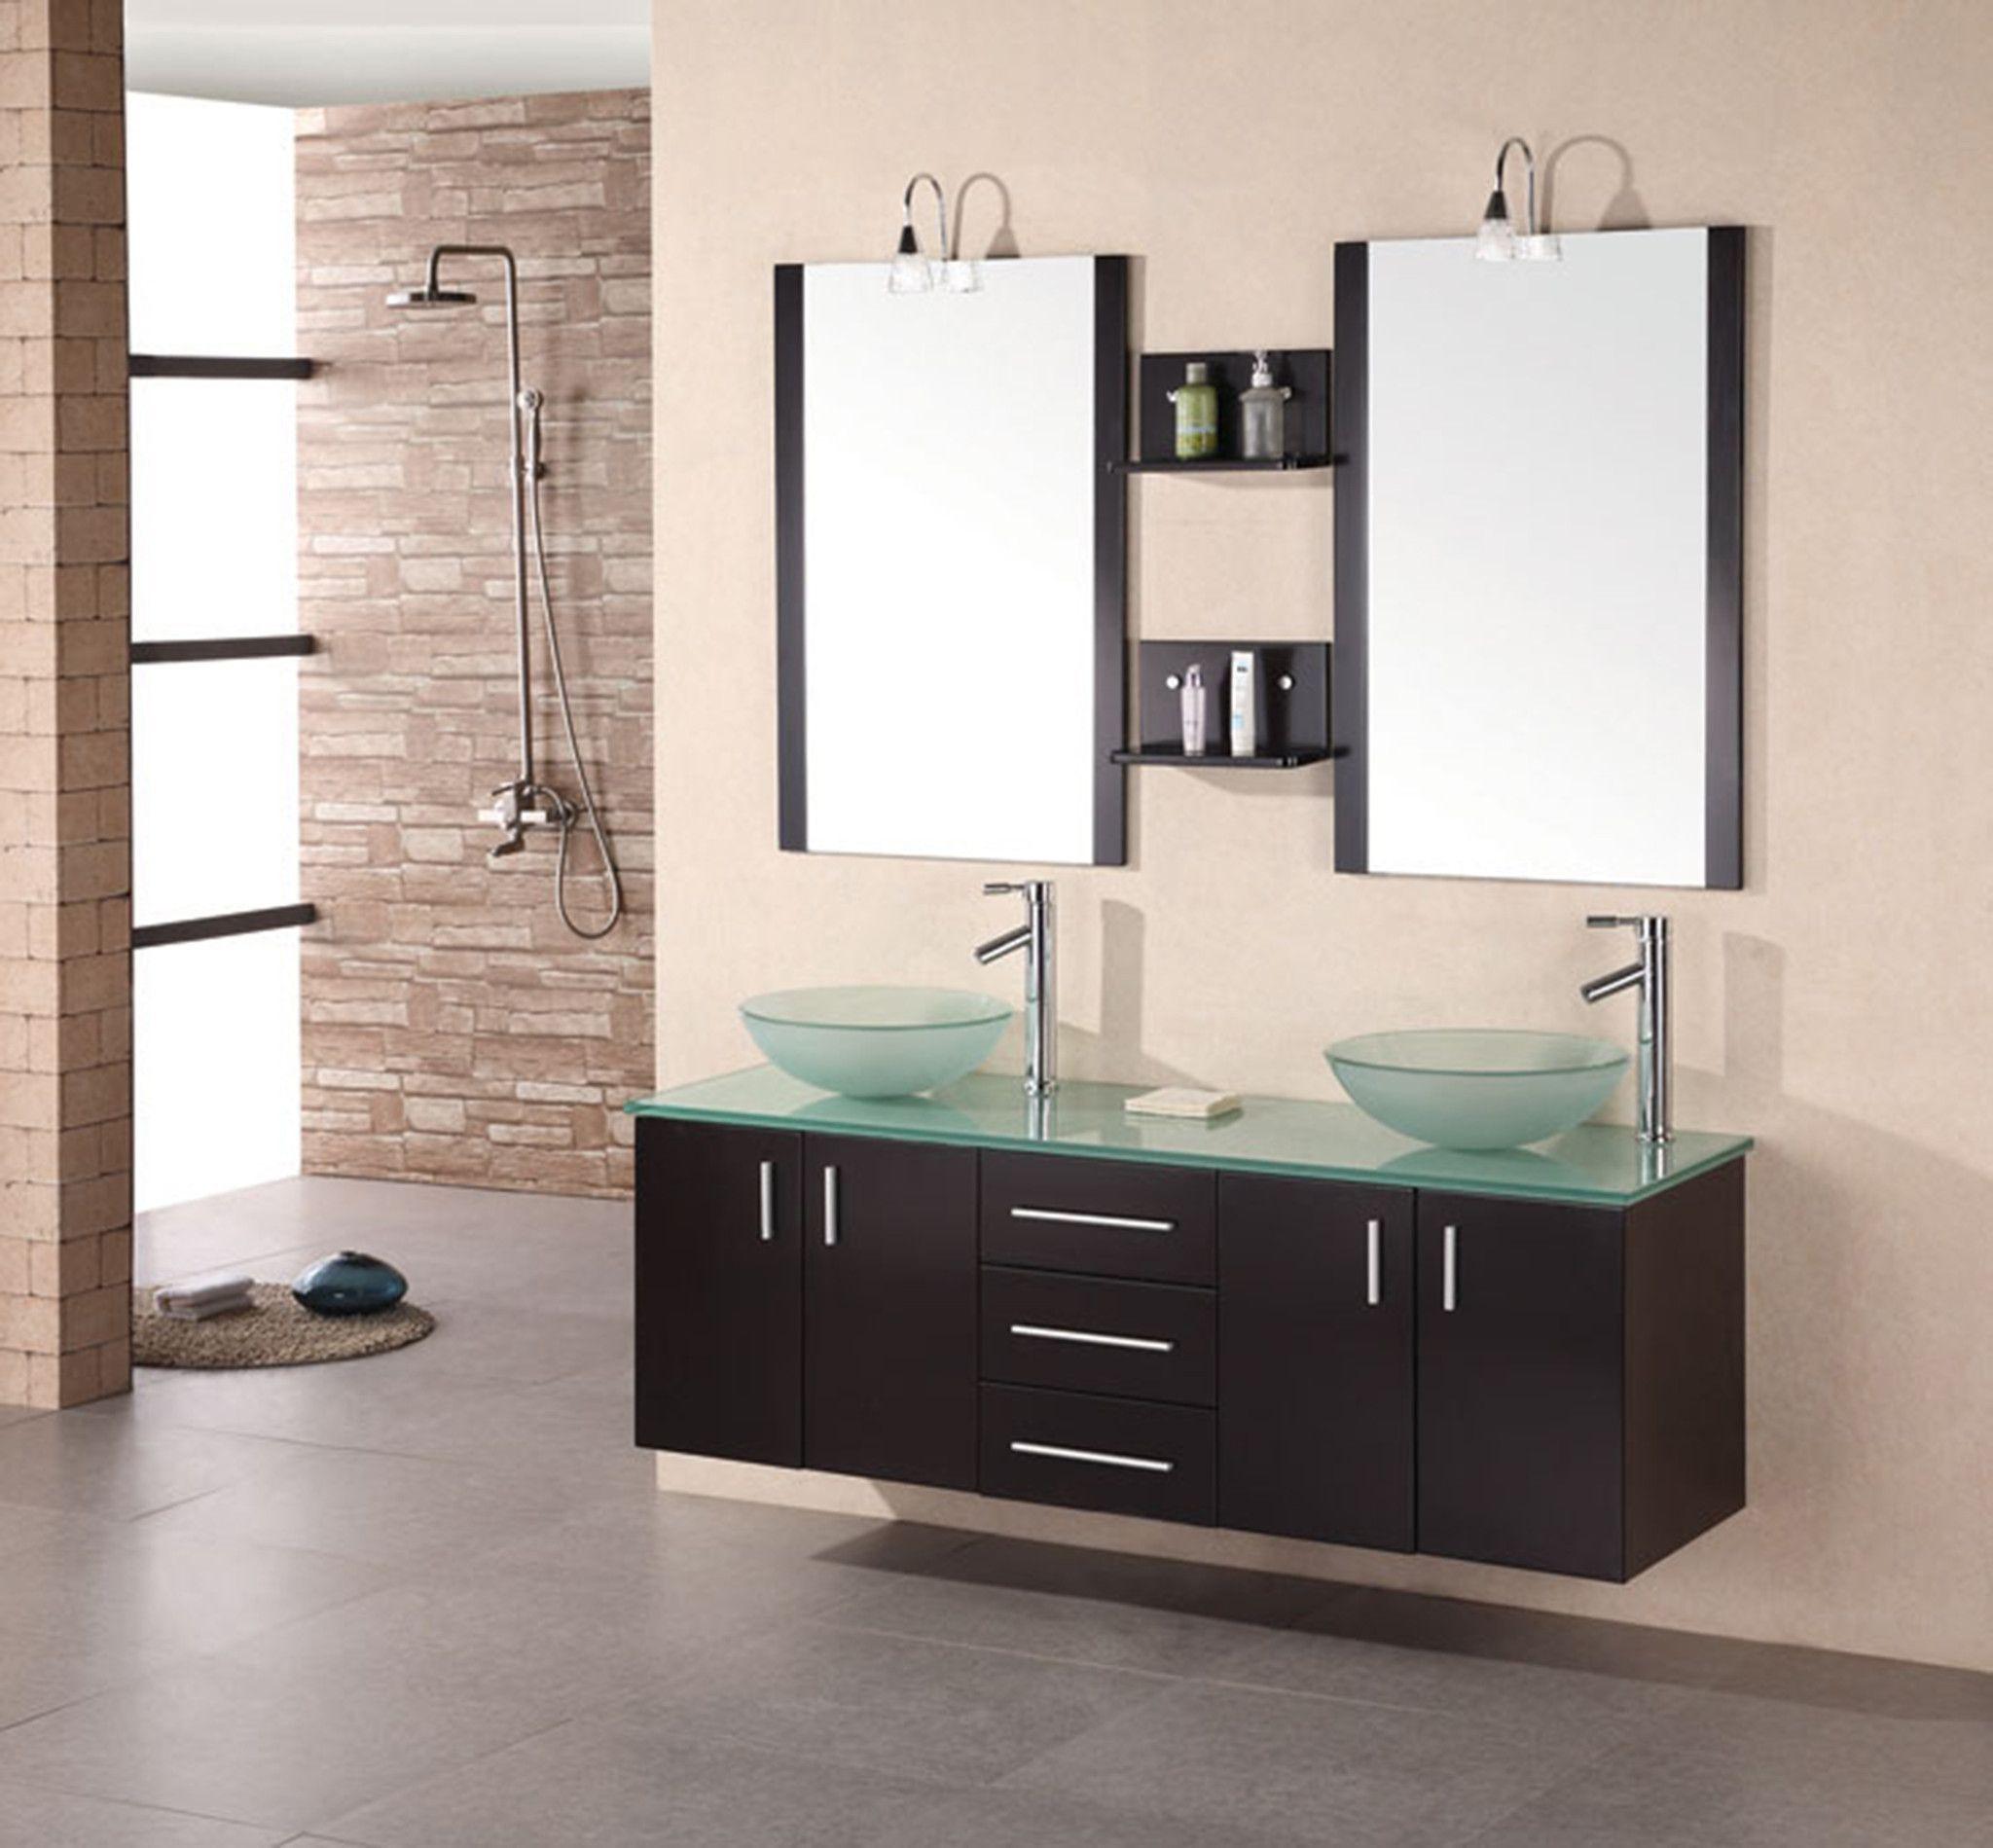 "Portland 61"" Double Vessel Sink - Wall Mount Vanity Set in Espresso w/ Jade Glass Countertop & Sinks"